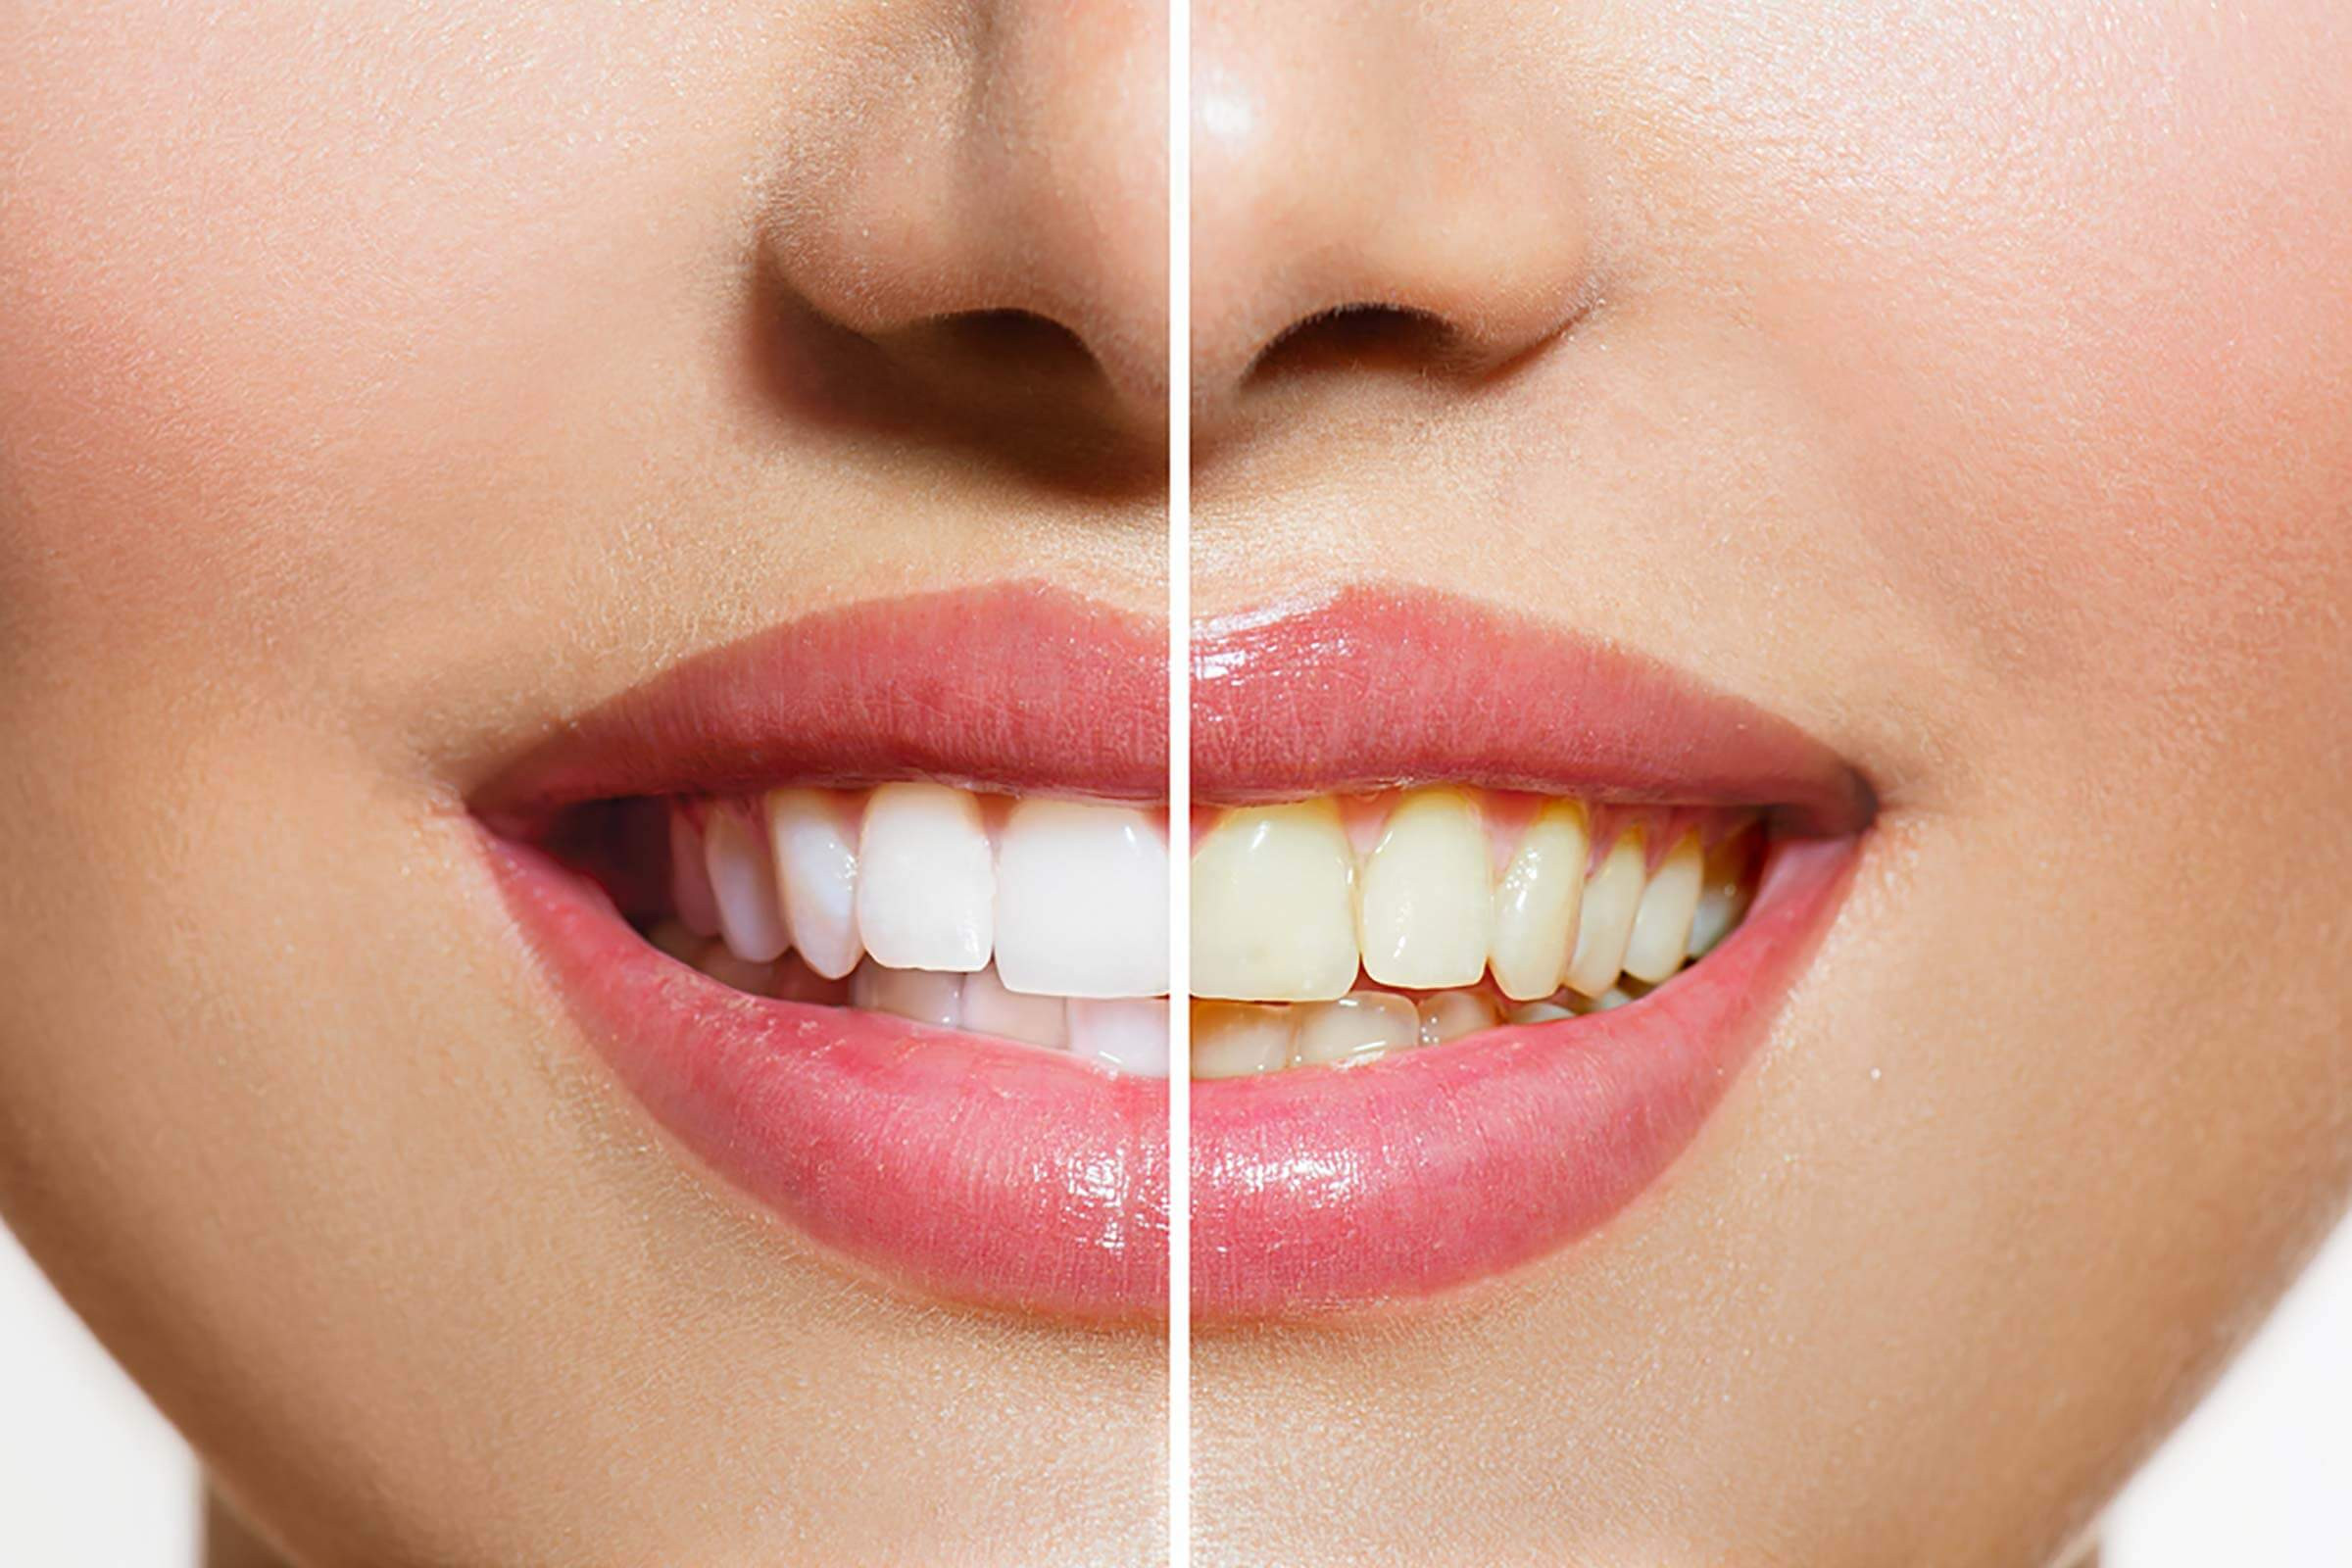 Teeth Whitening Session